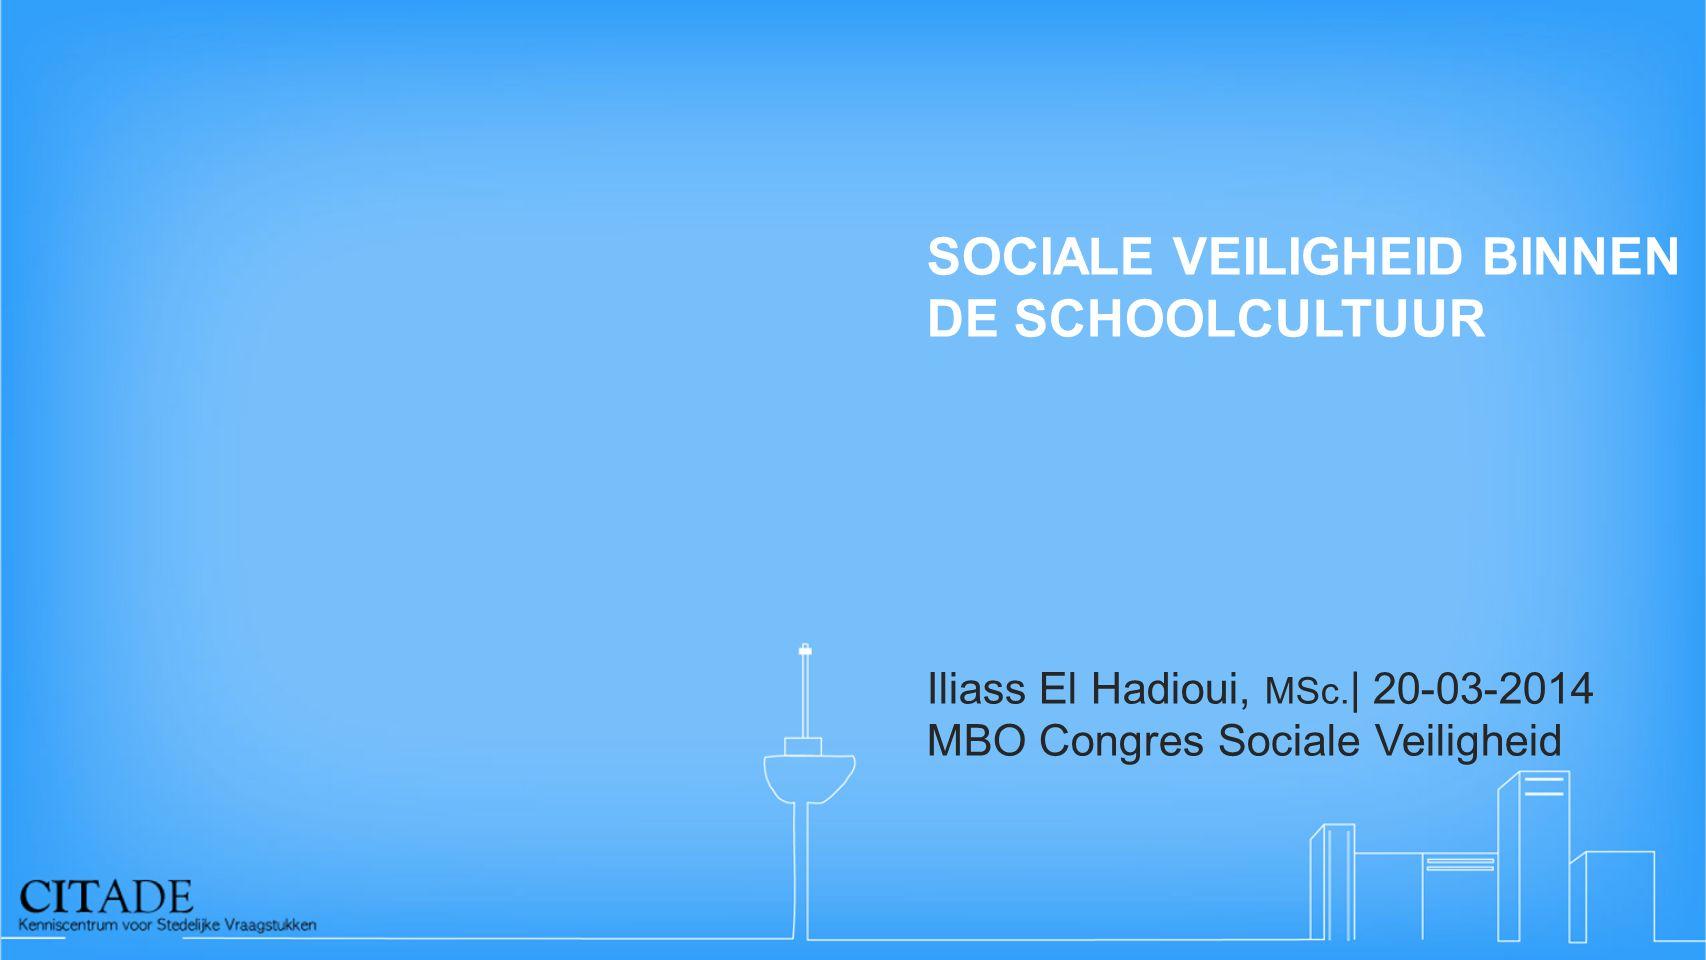 SOCIALE VEILIGHEID BINNEN DE SCHOOLCULTUUR Iliass El Hadioui, MSc. | 20-03-2014 MBO Congres Sociale Veiligheid